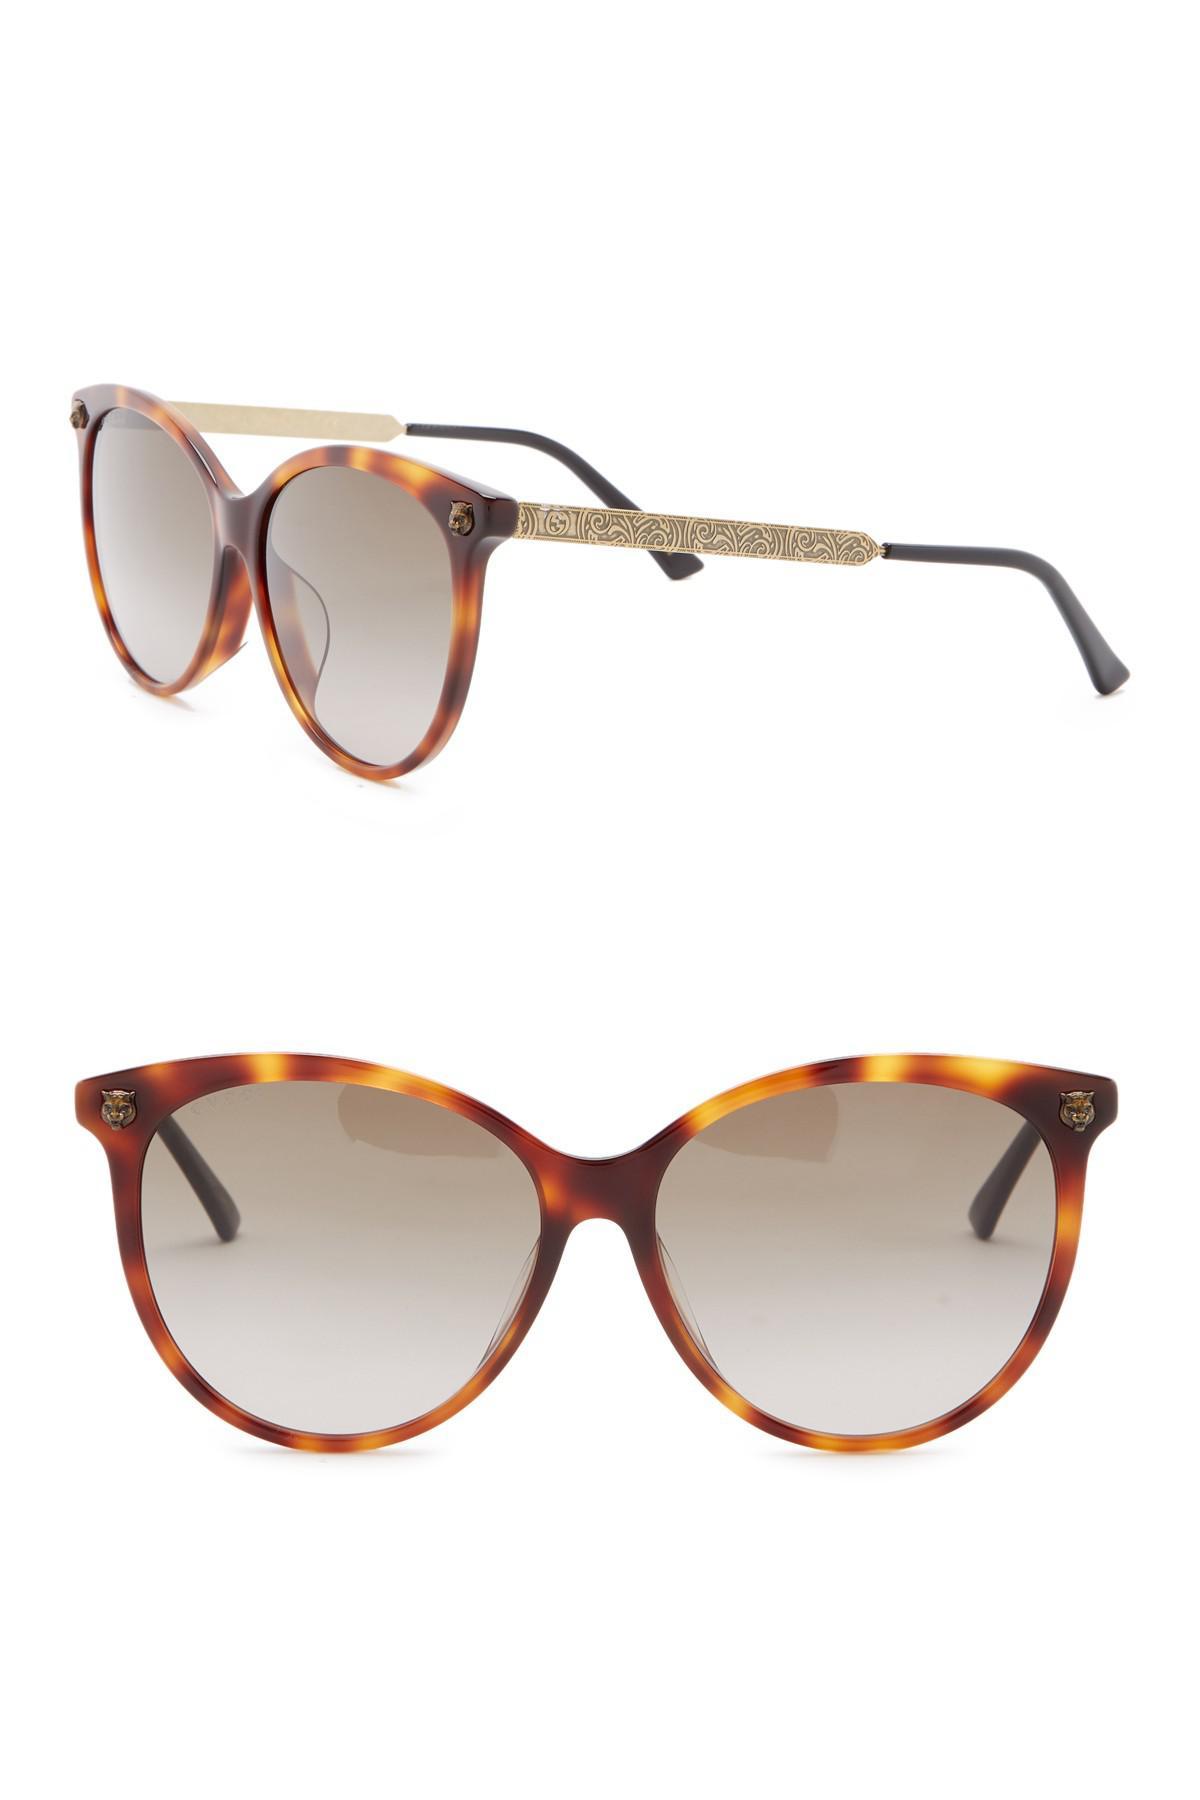 380c1a8a5af Lyst - Gucci 57mm Round Sunglasses in Brown